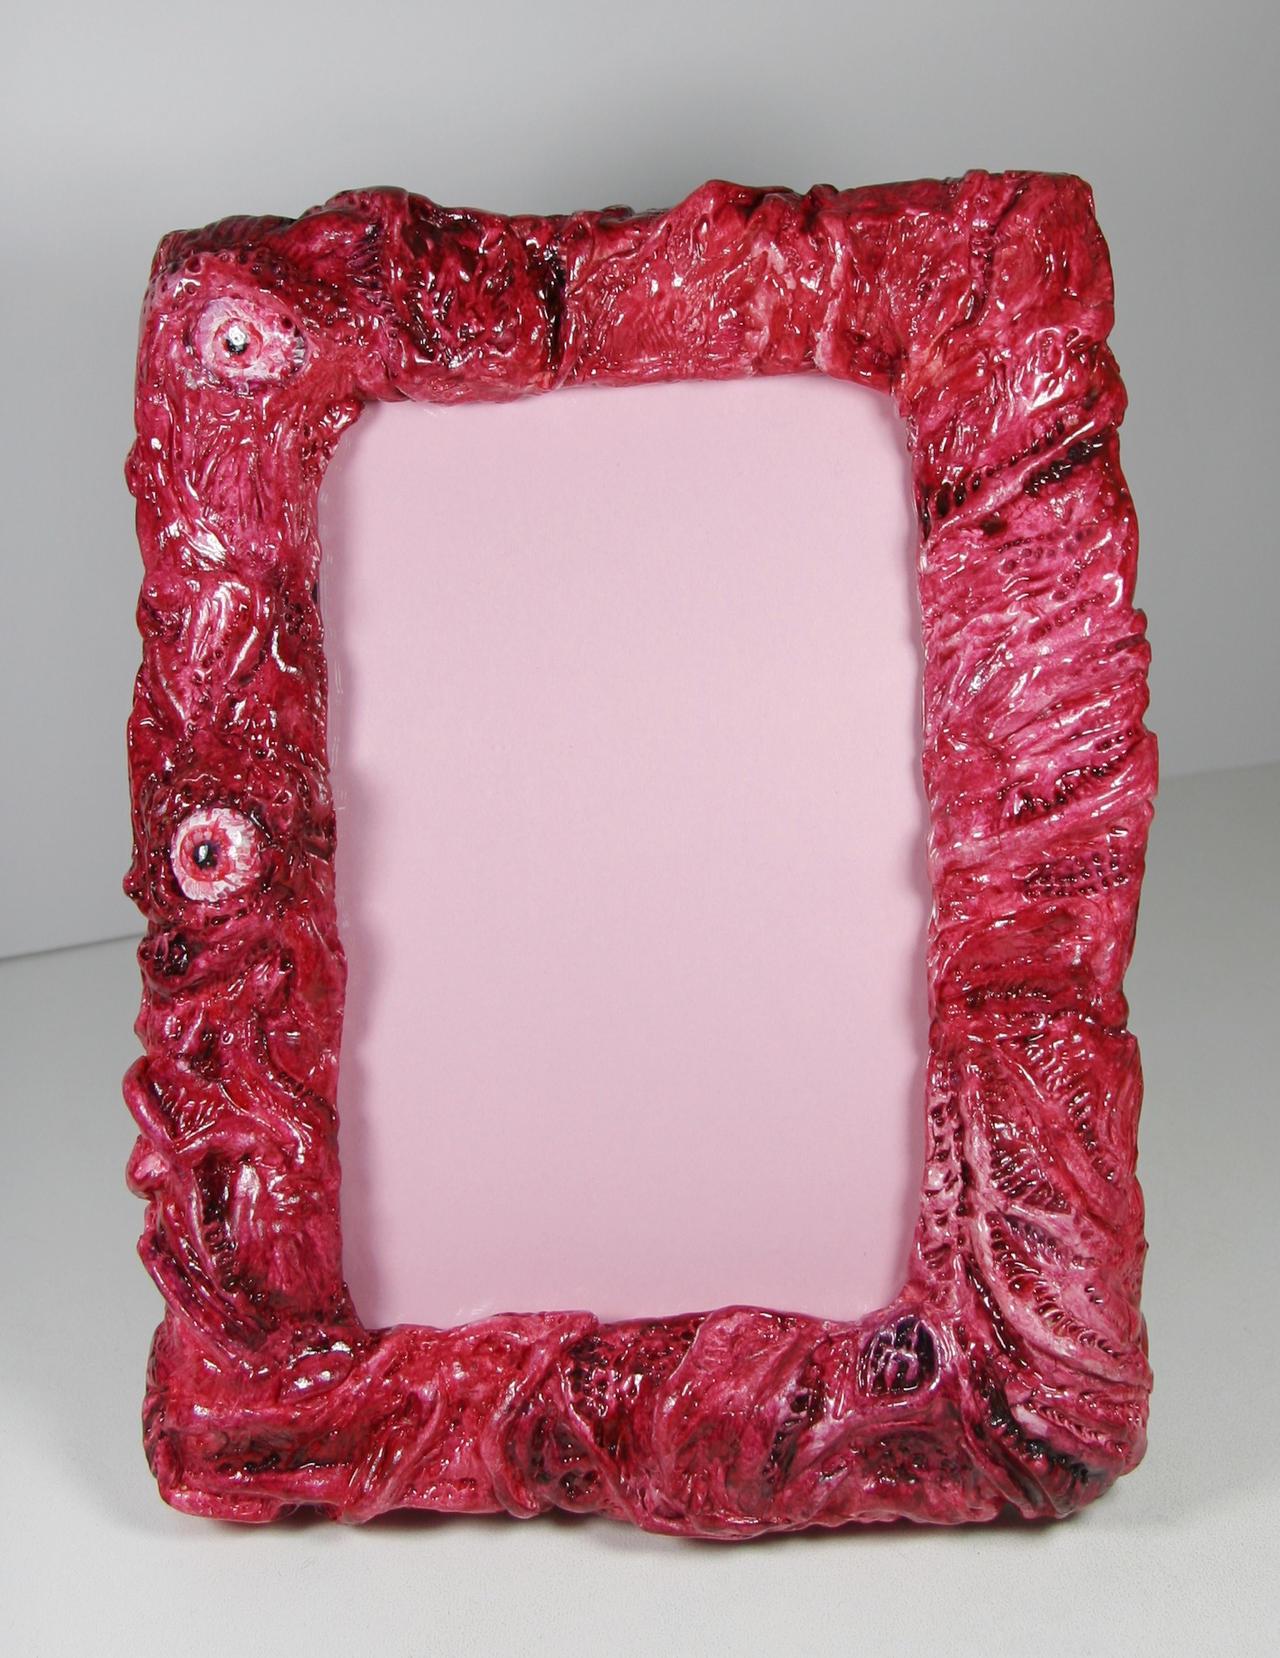 Custom frame 1 by Alderfly